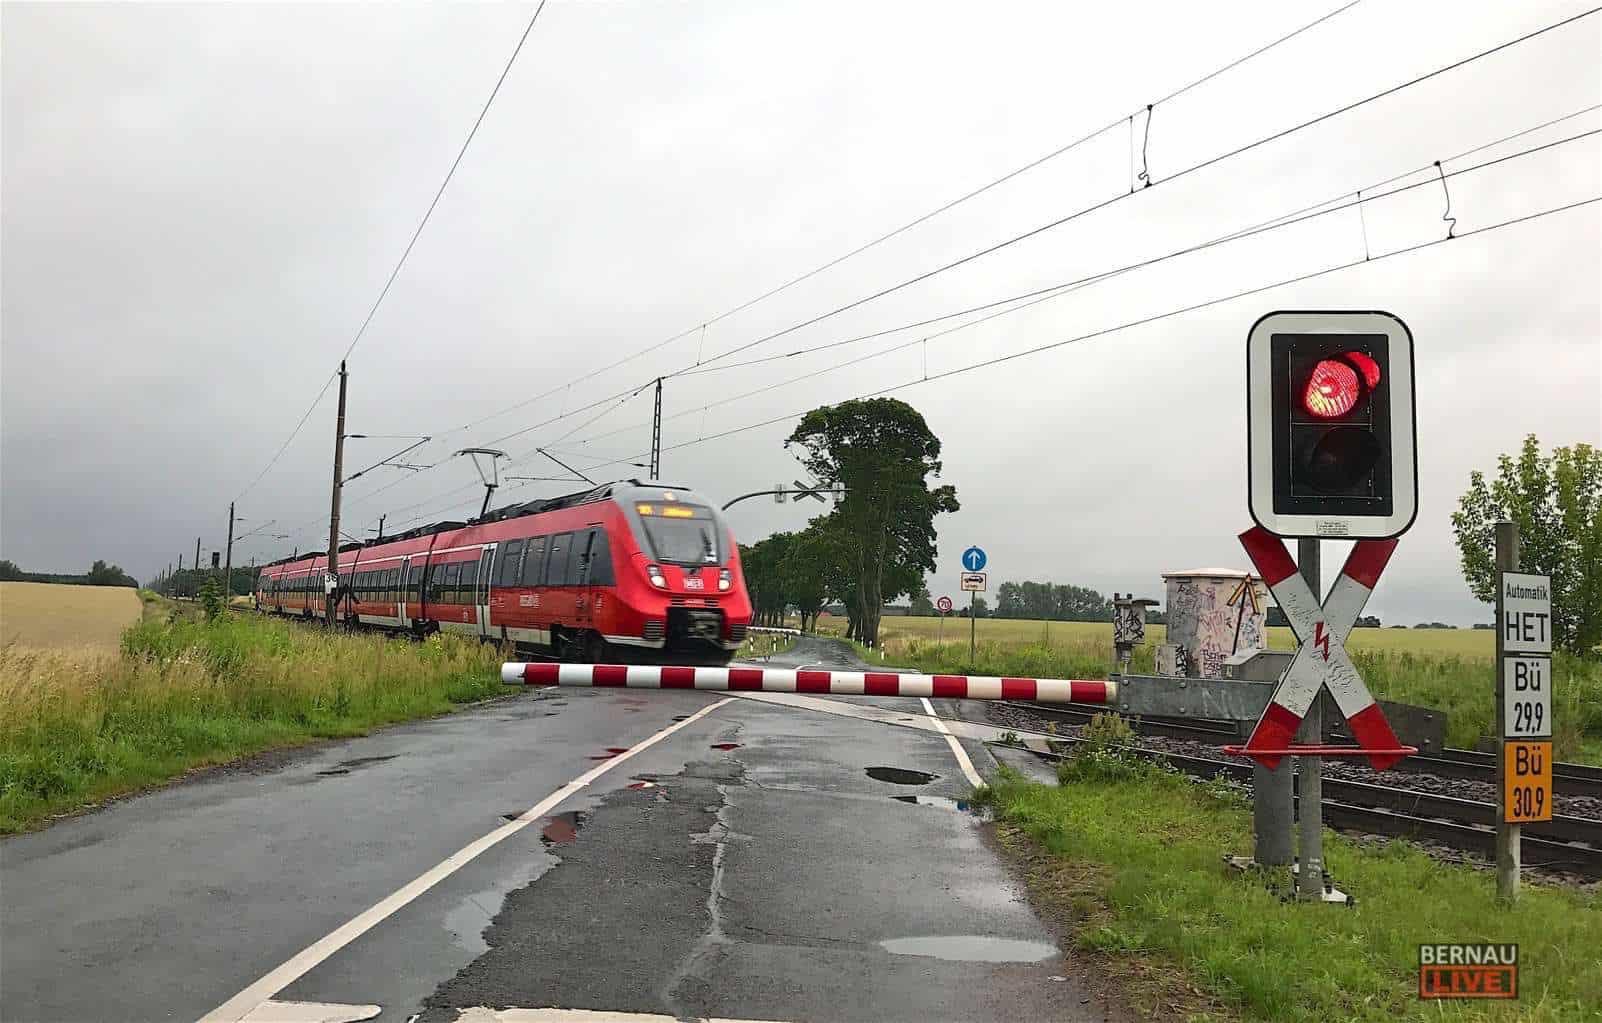 Bahn Bahnuebergang IMG 5248 Bernau LIVE RE3